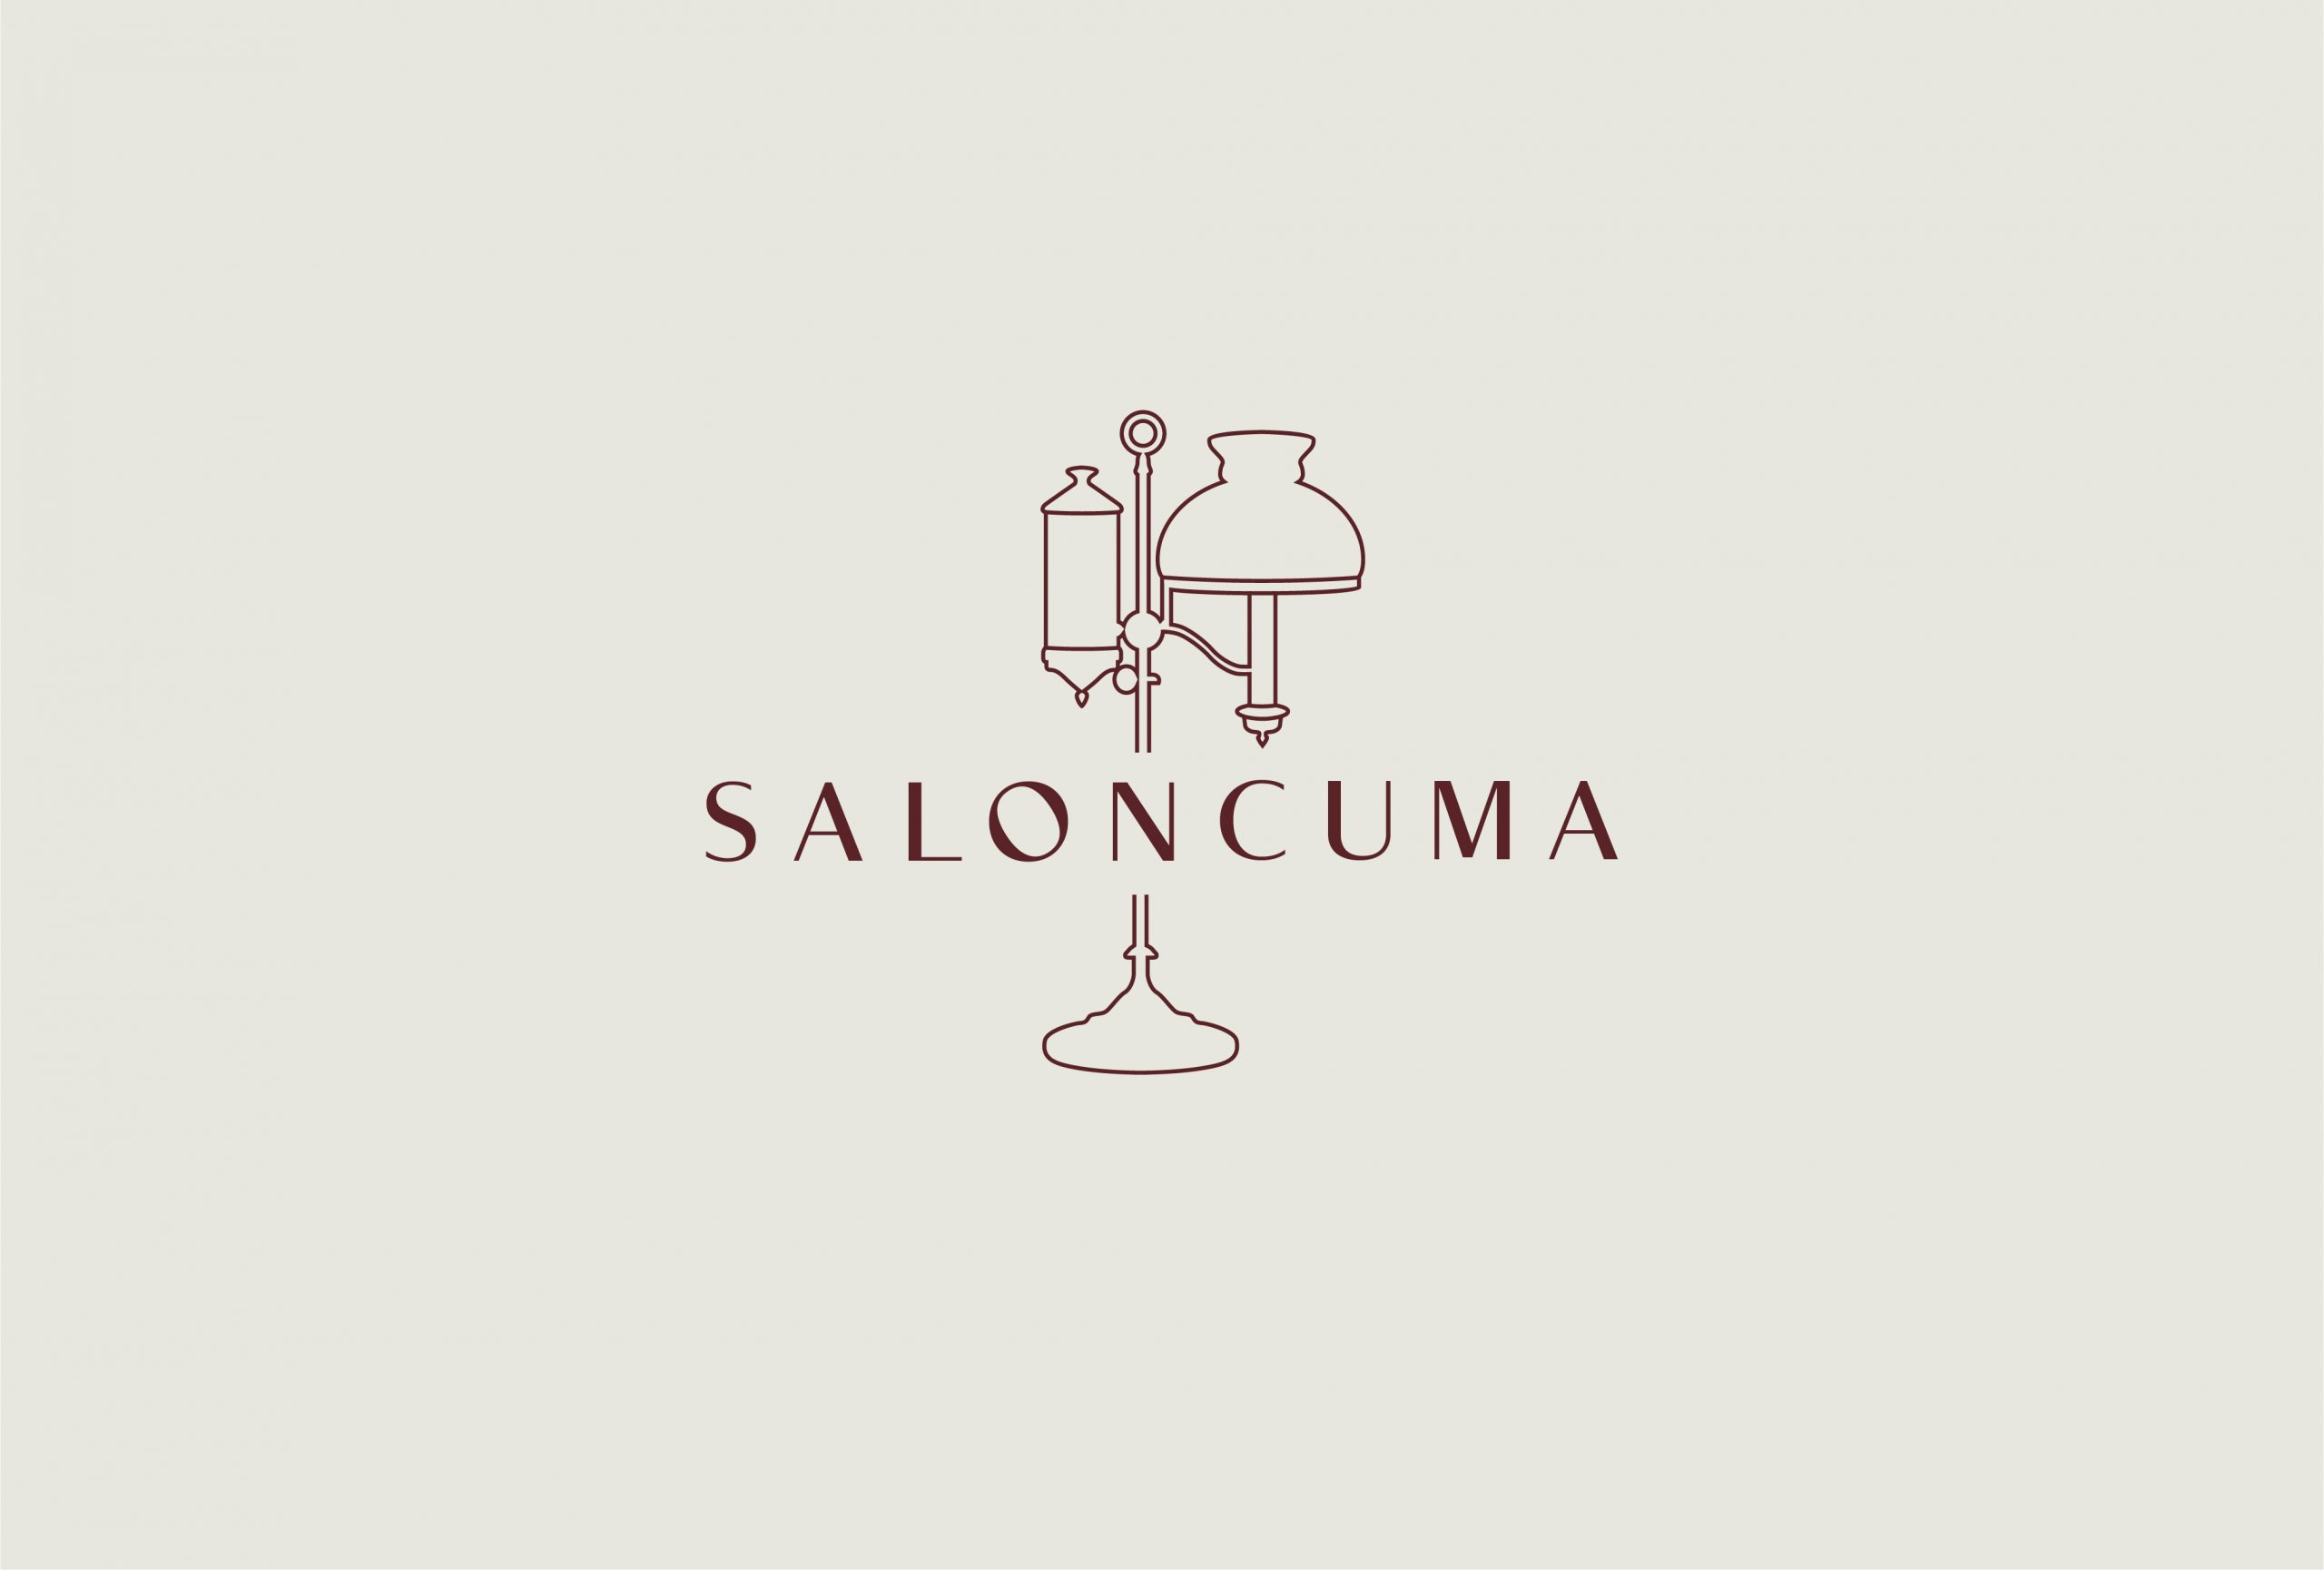 SalonCuma